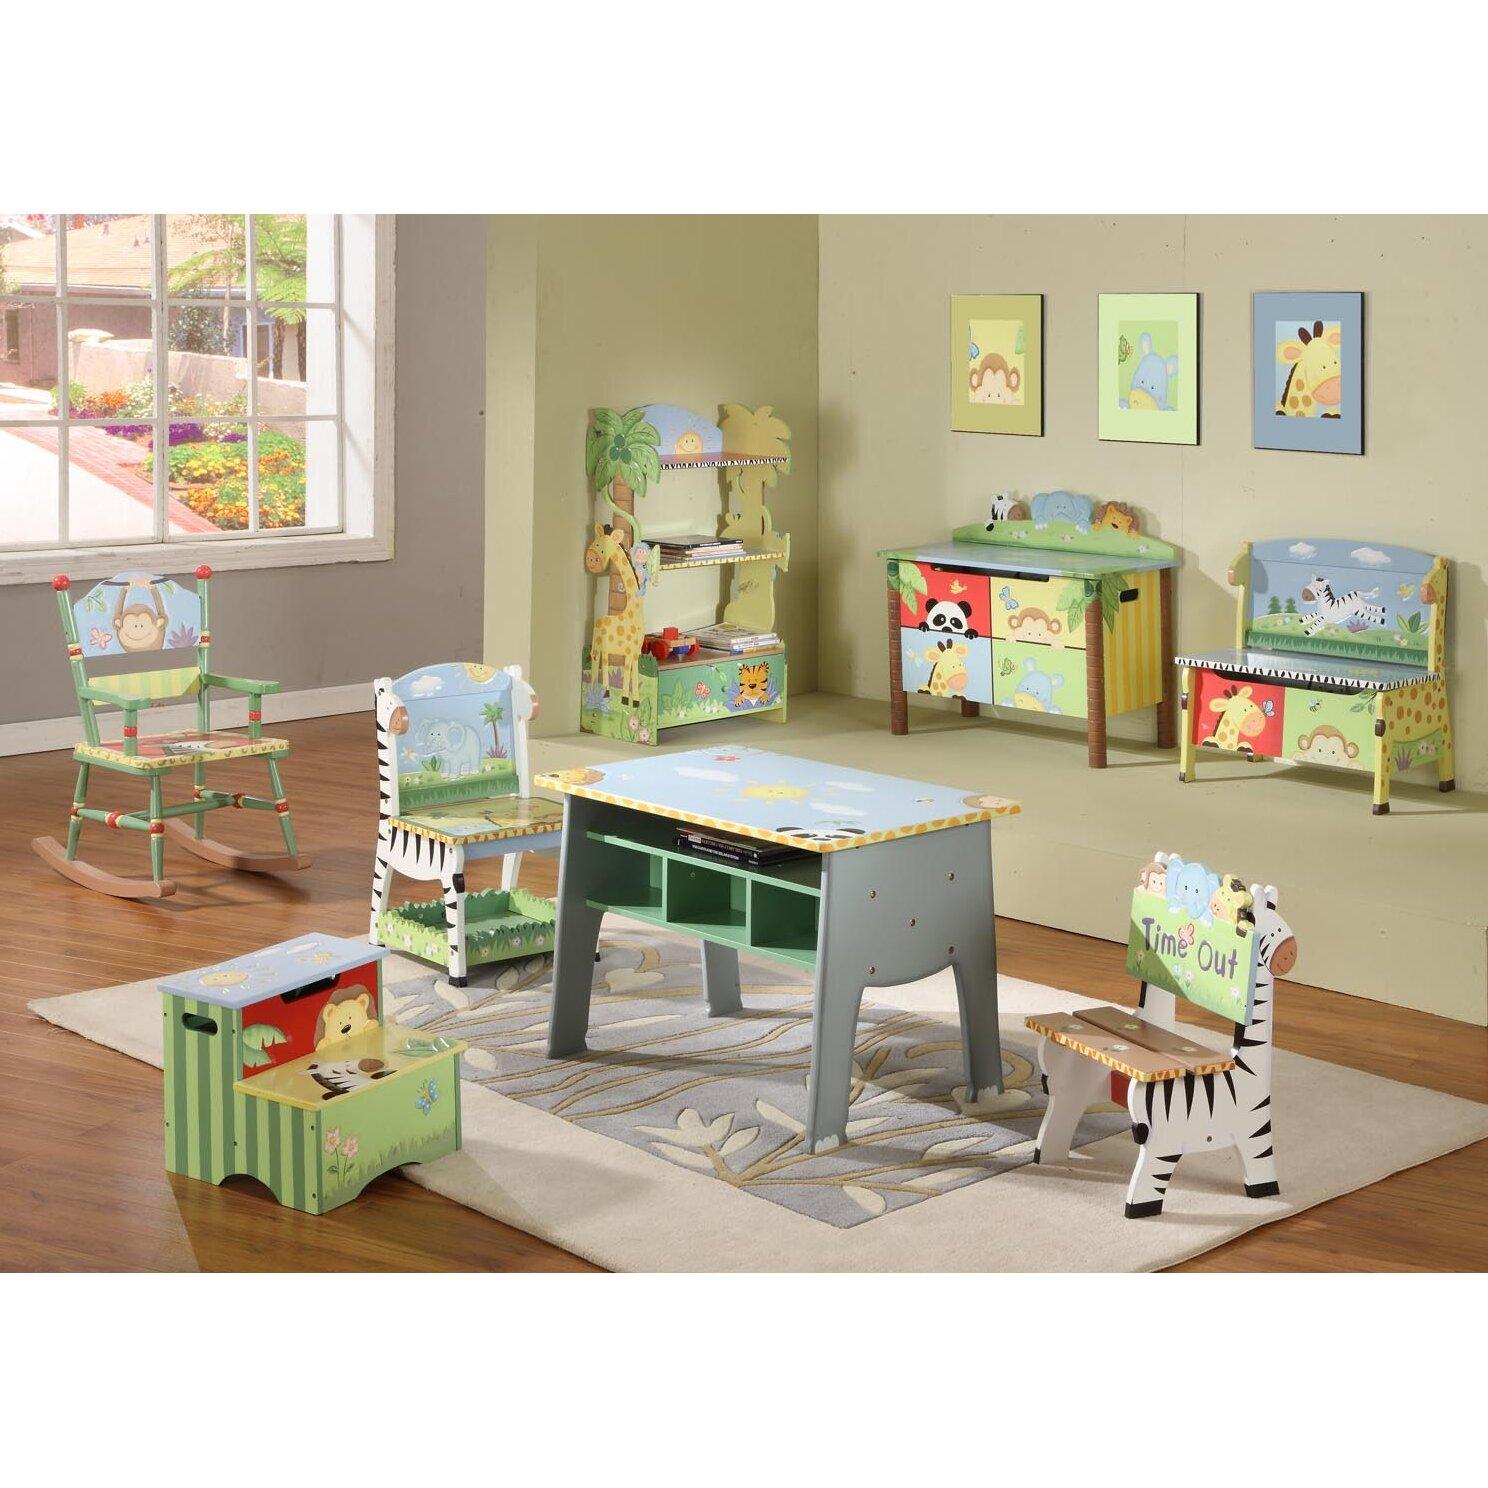 fantasy fields sunny safari kids arts and crafts table. Black Bedroom Furniture Sets. Home Design Ideas